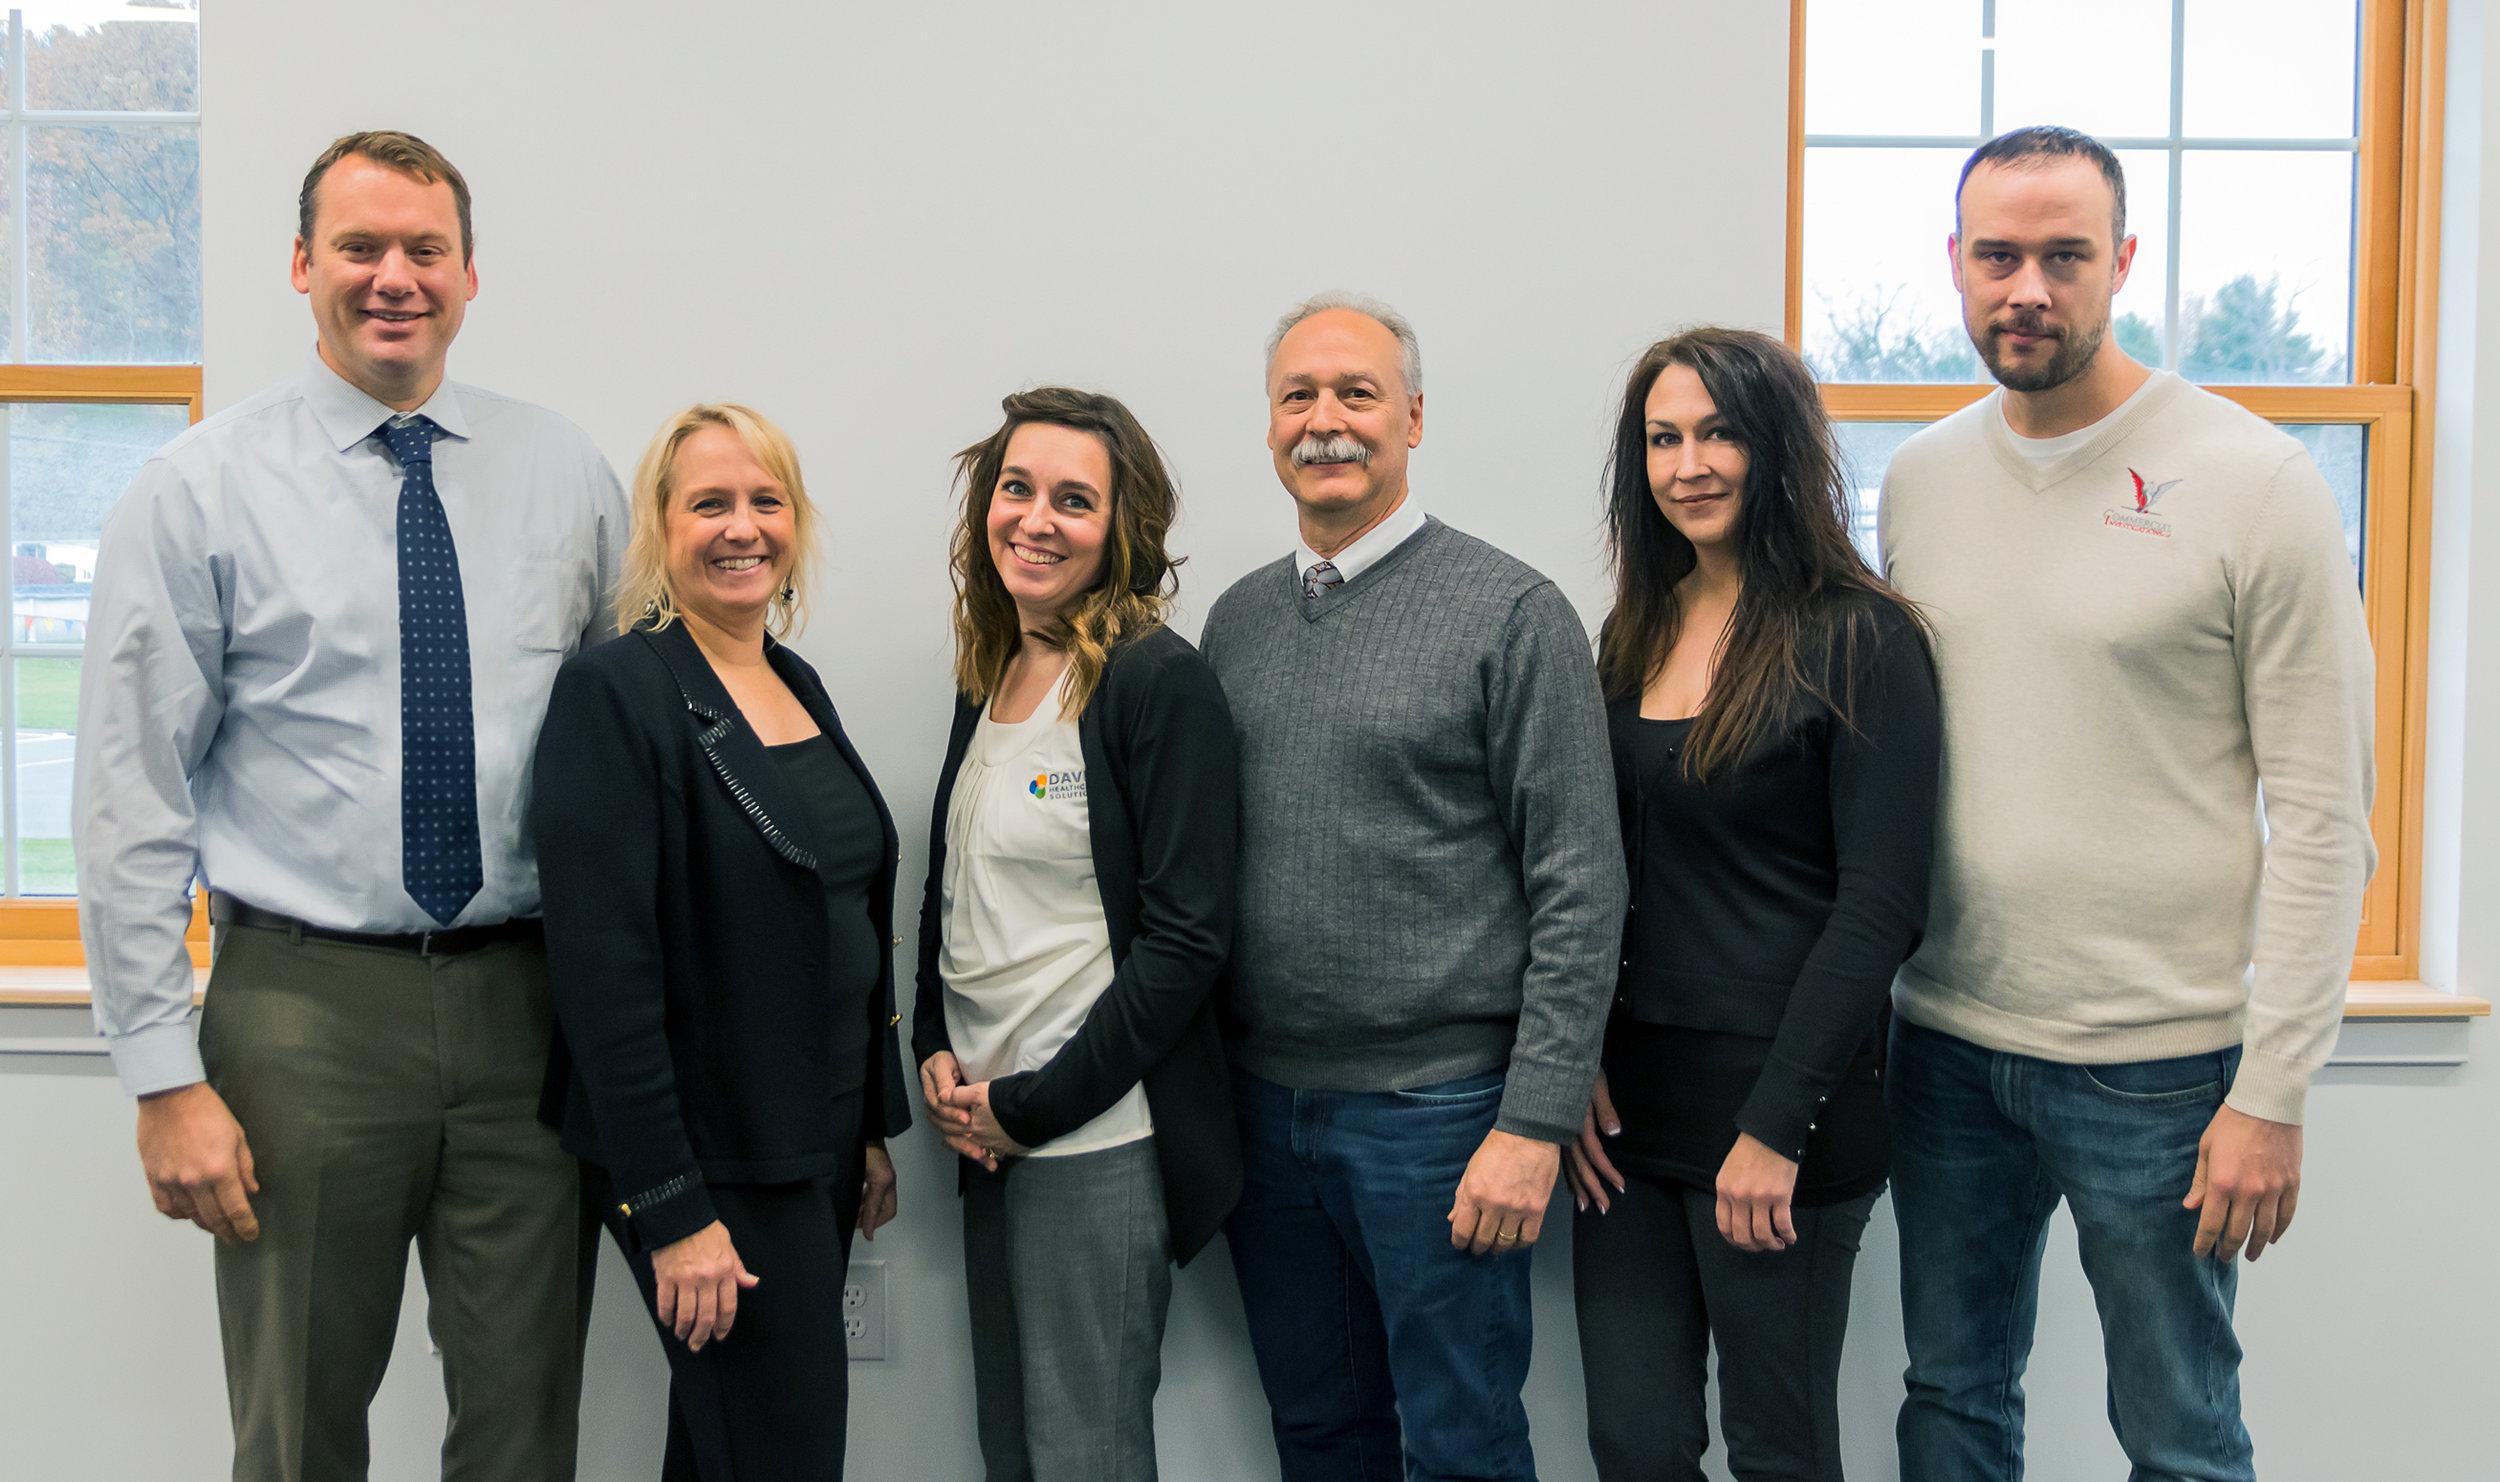 David Theobald, Michelle Pyan, Sarah Pechar, Mike Zinni, Sherry Kocienski, Craig Wigand